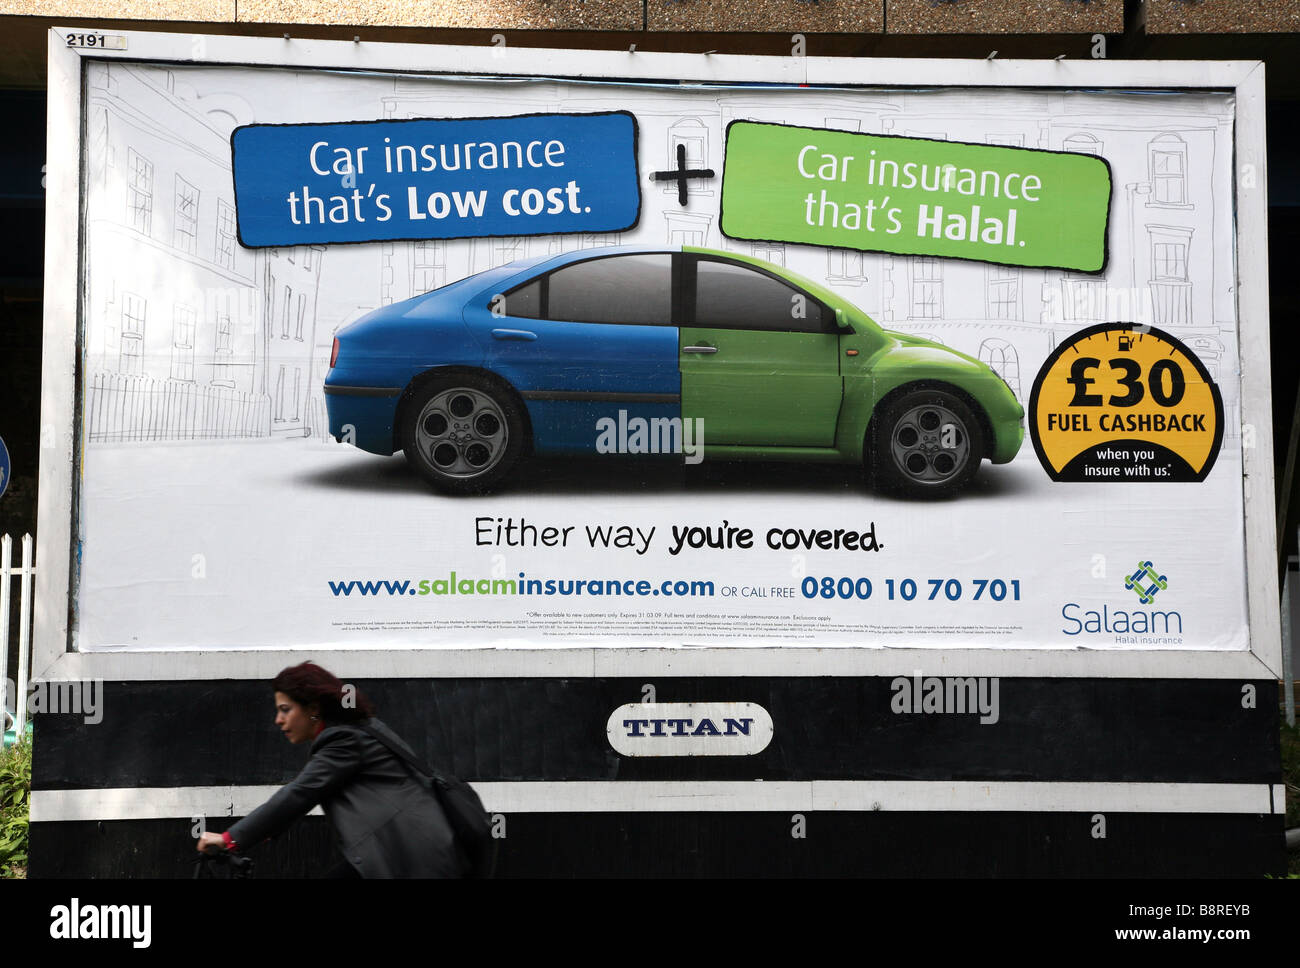 Advert for Halal car insurance, East London - Stock Image